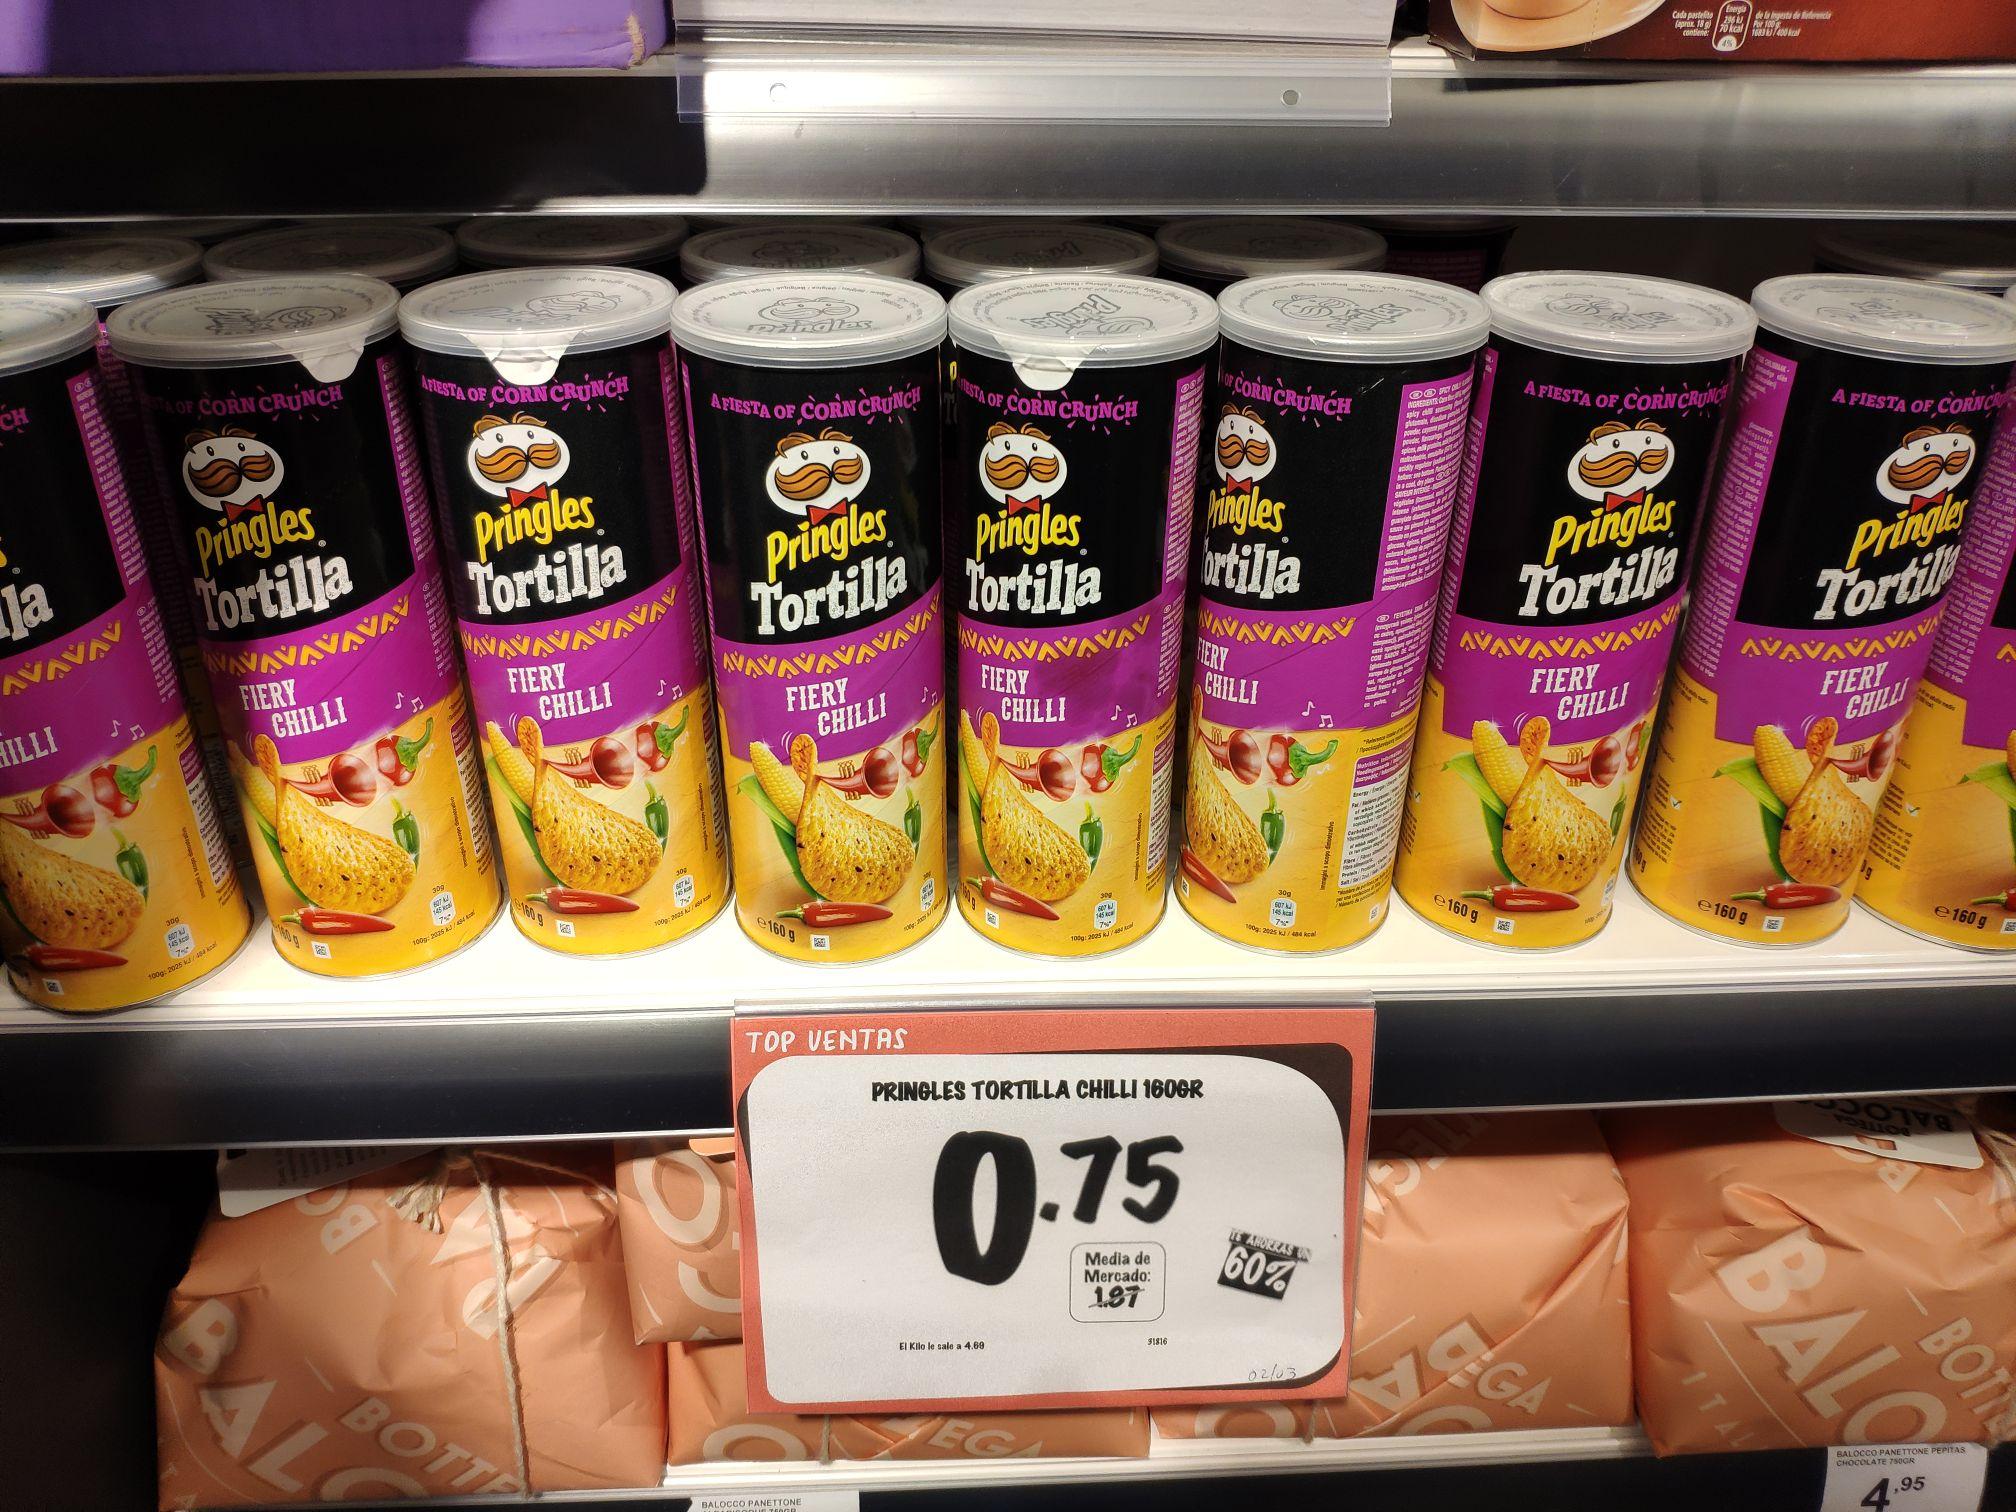 Pringles tortilla chili en primaprix gijon